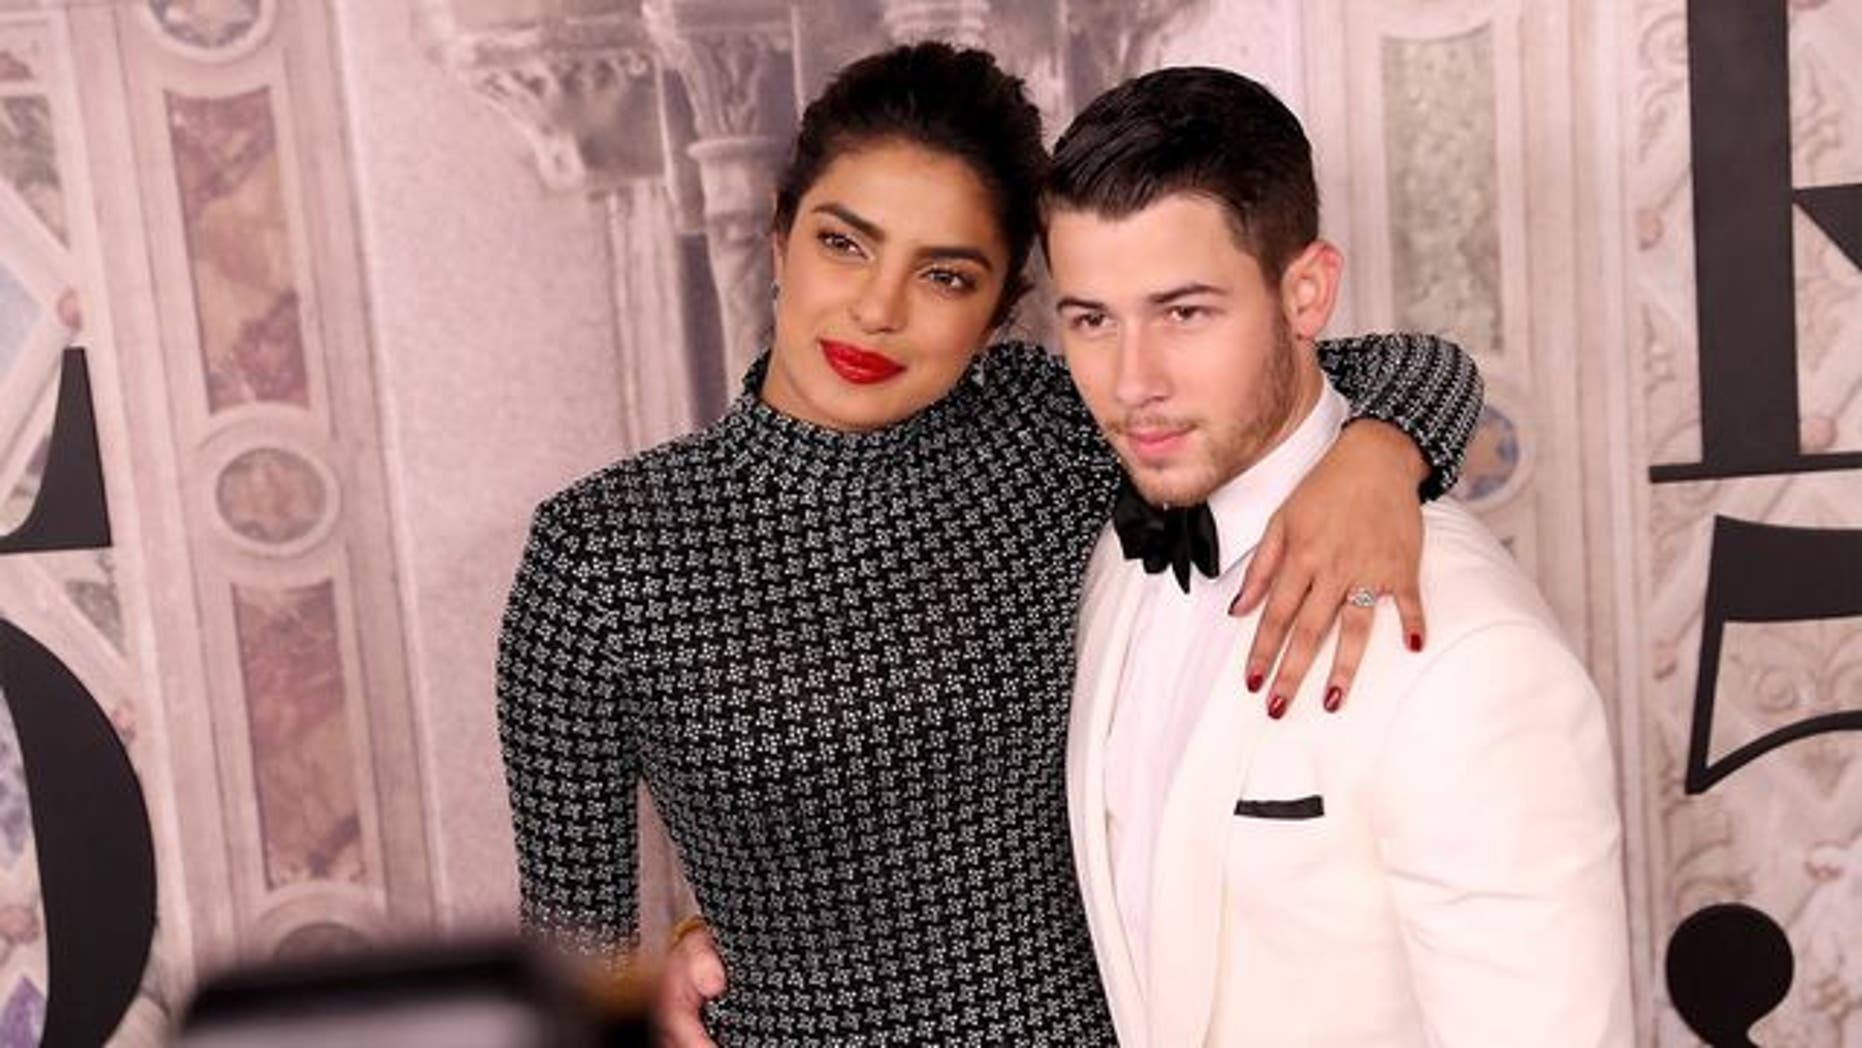 Nick Jonas andPriyanka Chopra marry in a lavish Indian ceremony.